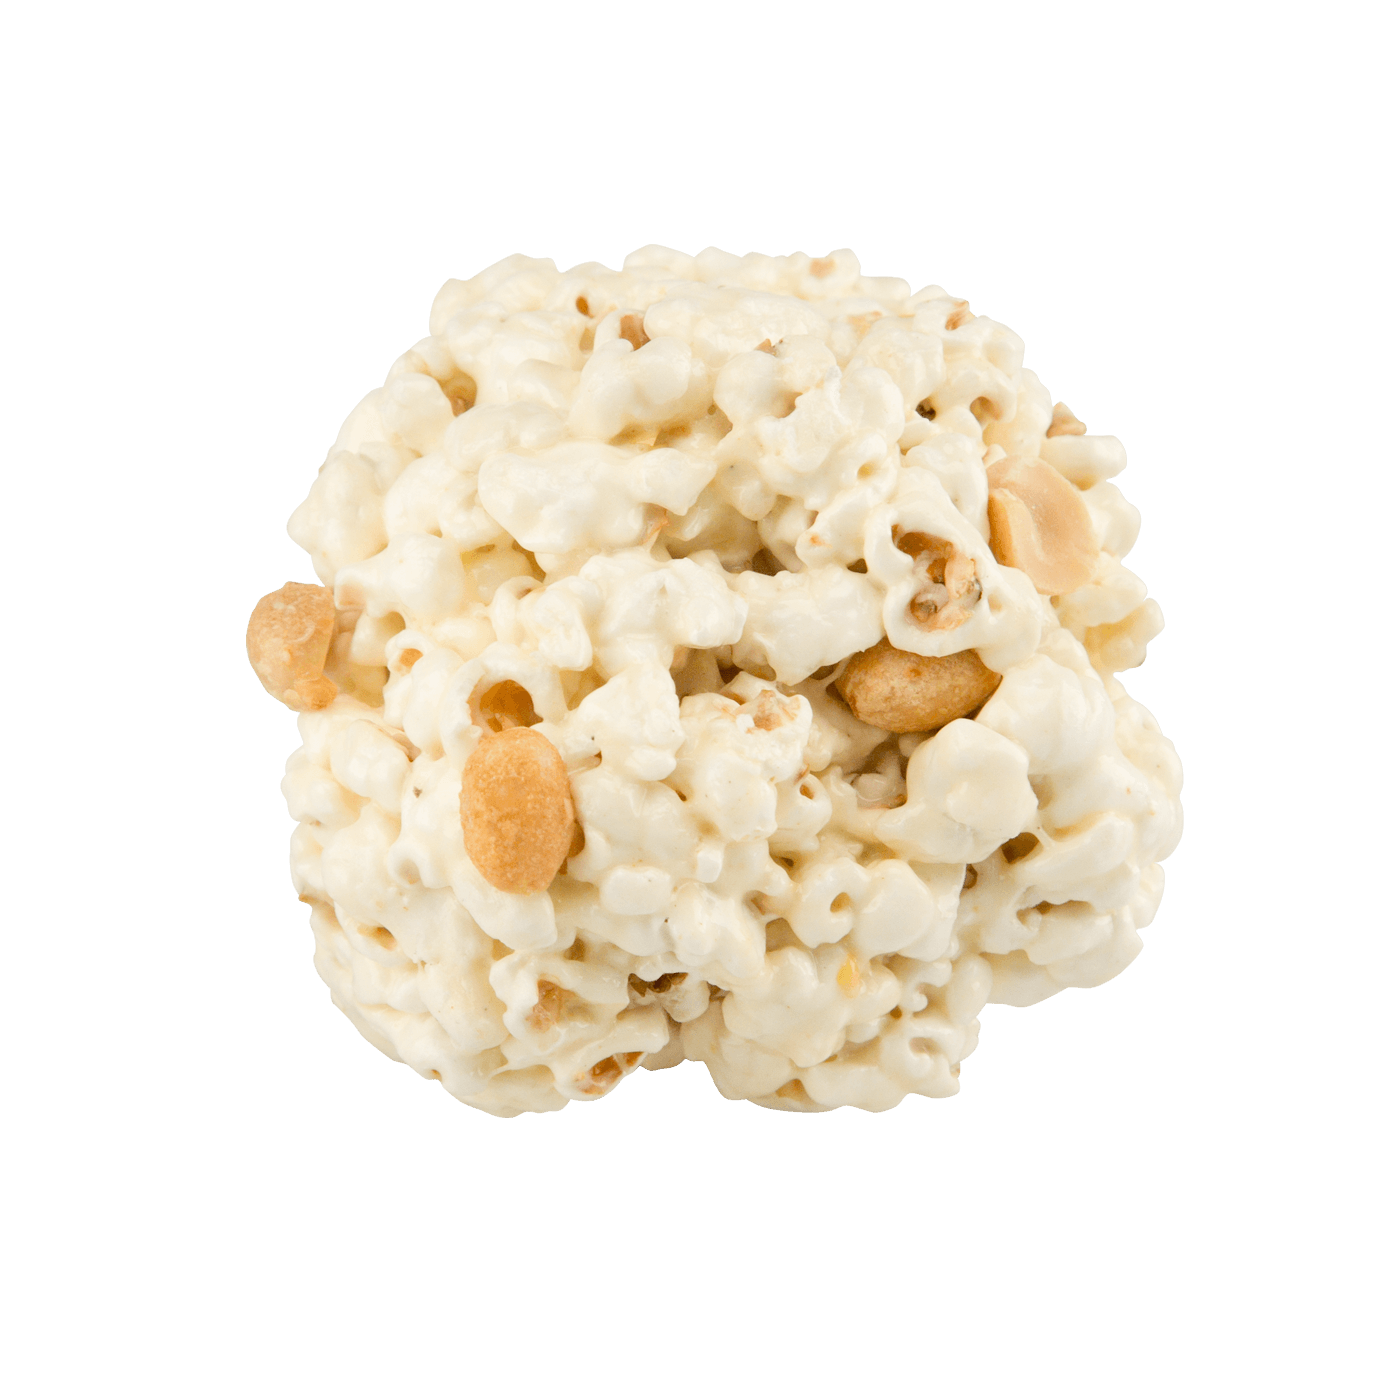 Farmer Jon's Popcorn Balls with Salted Peanuts